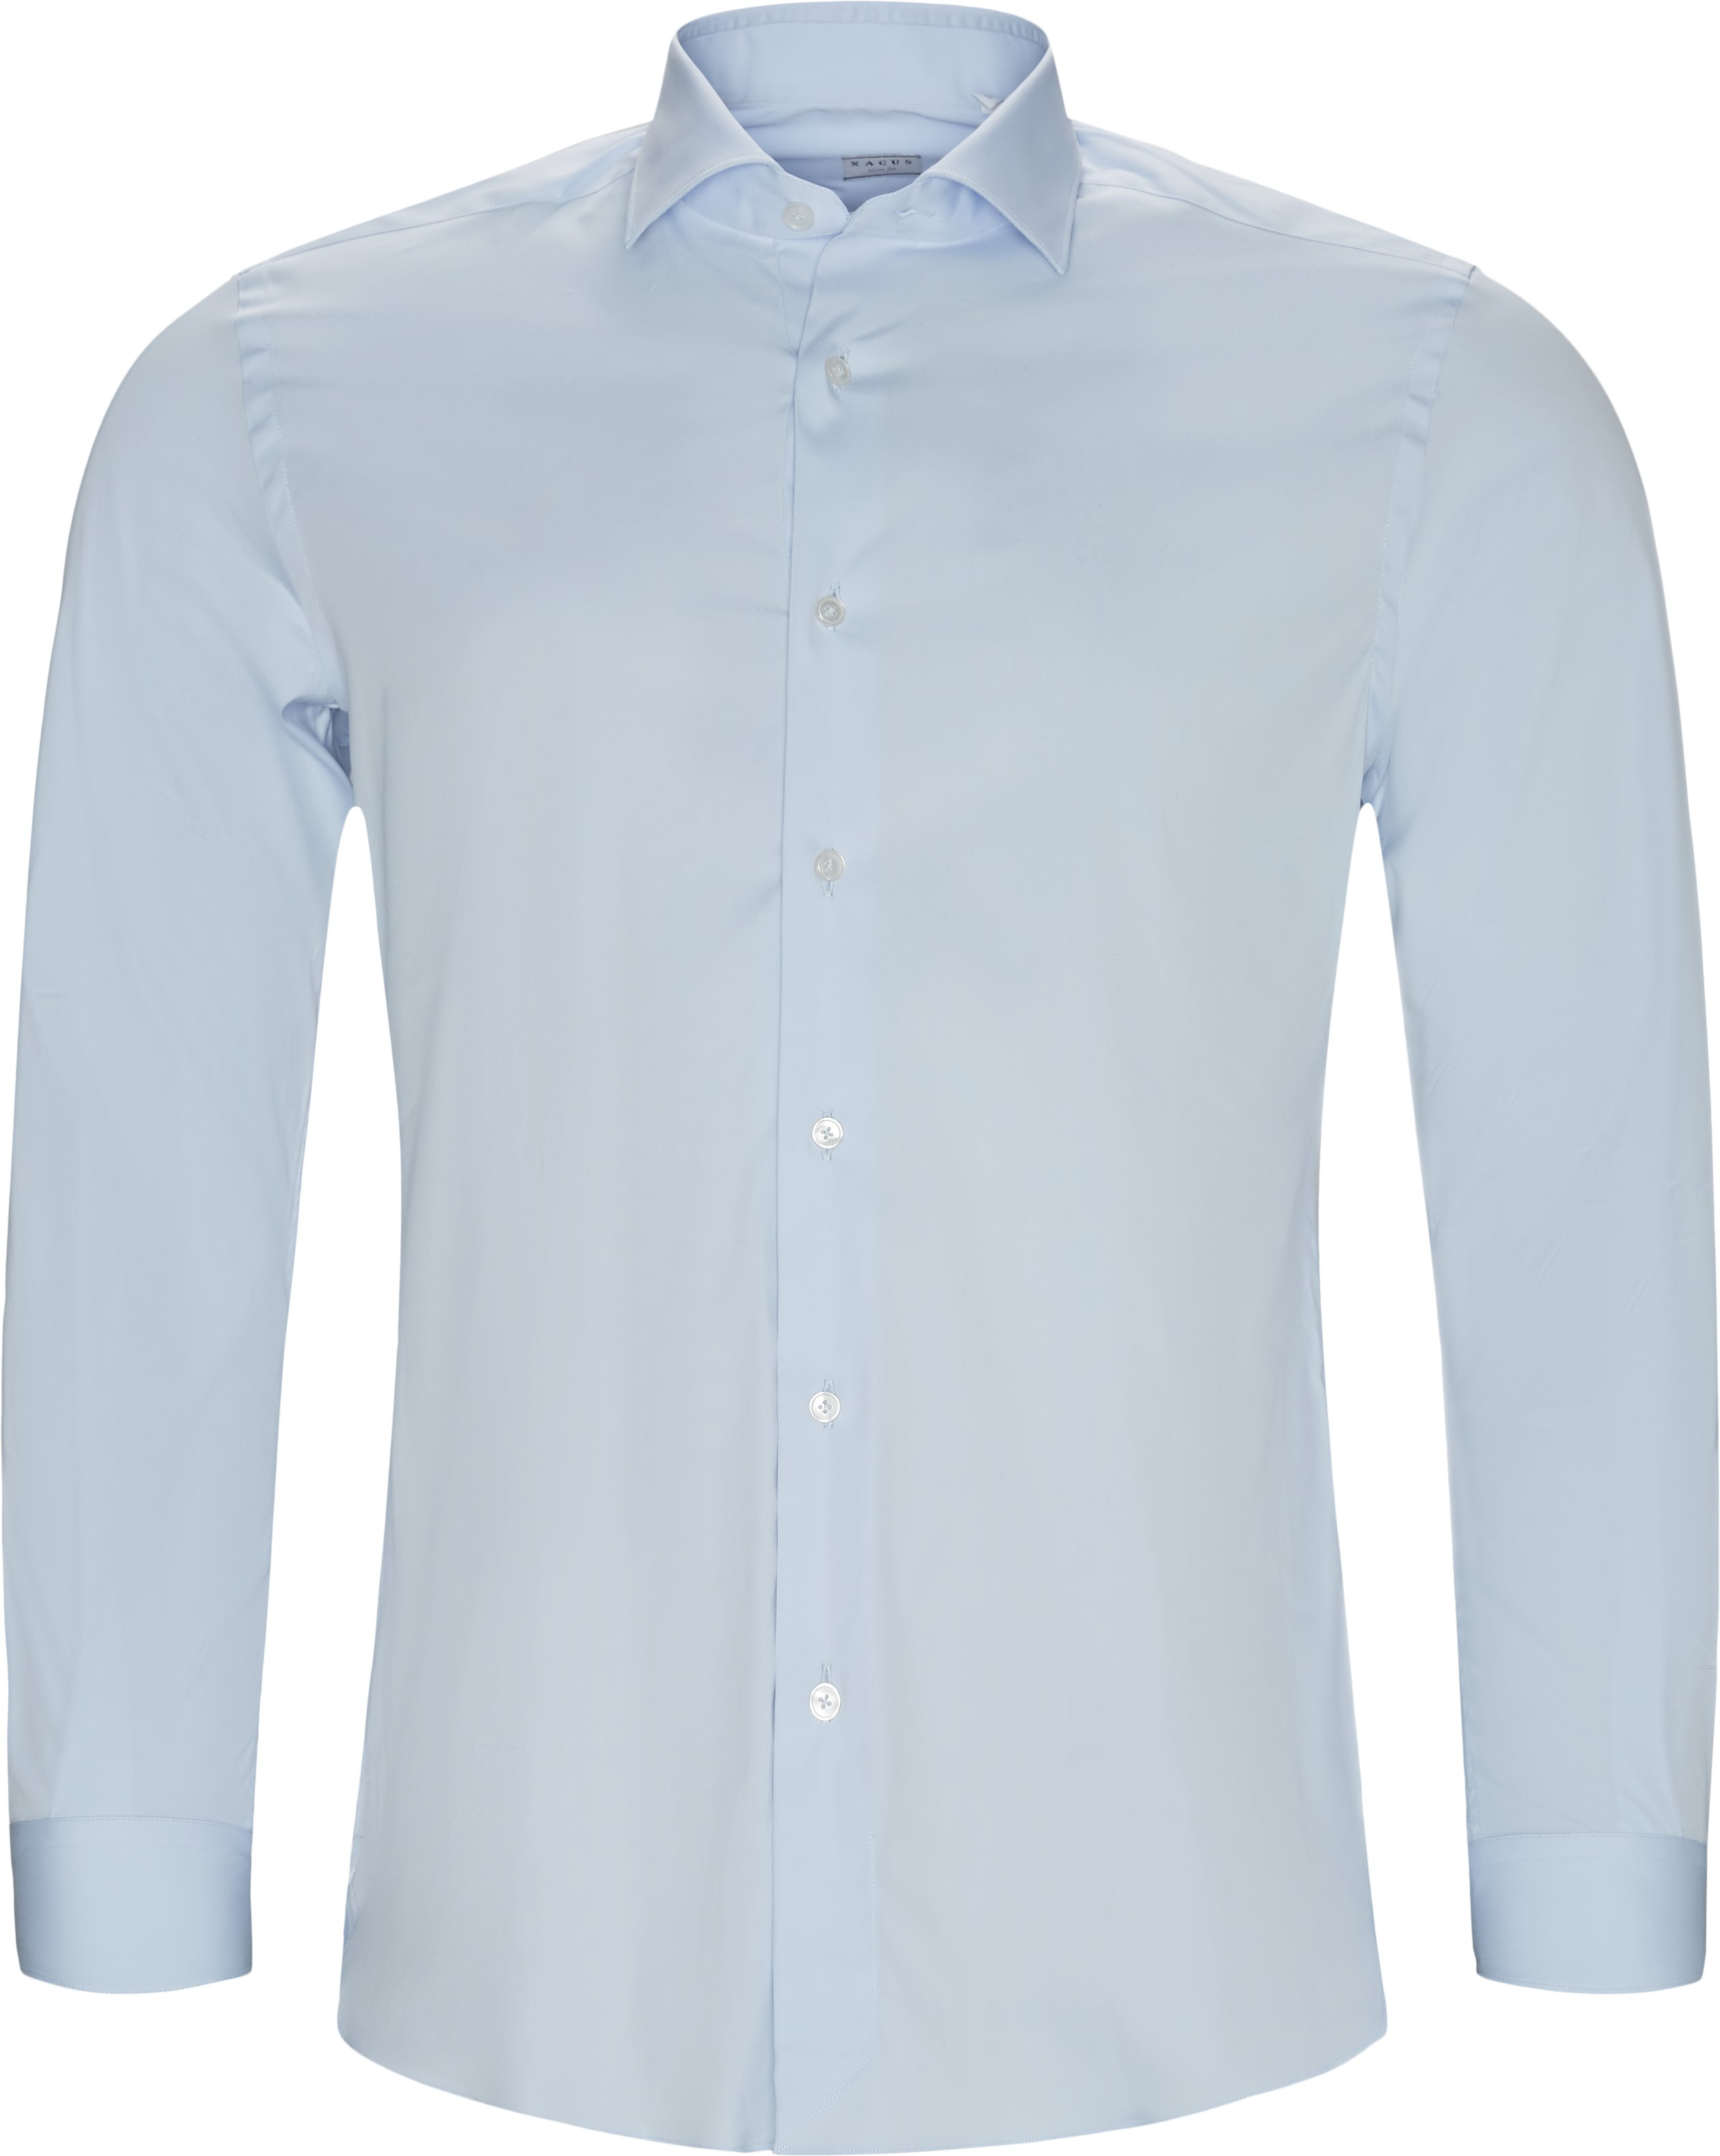 Shirts - Slim fit - Blue